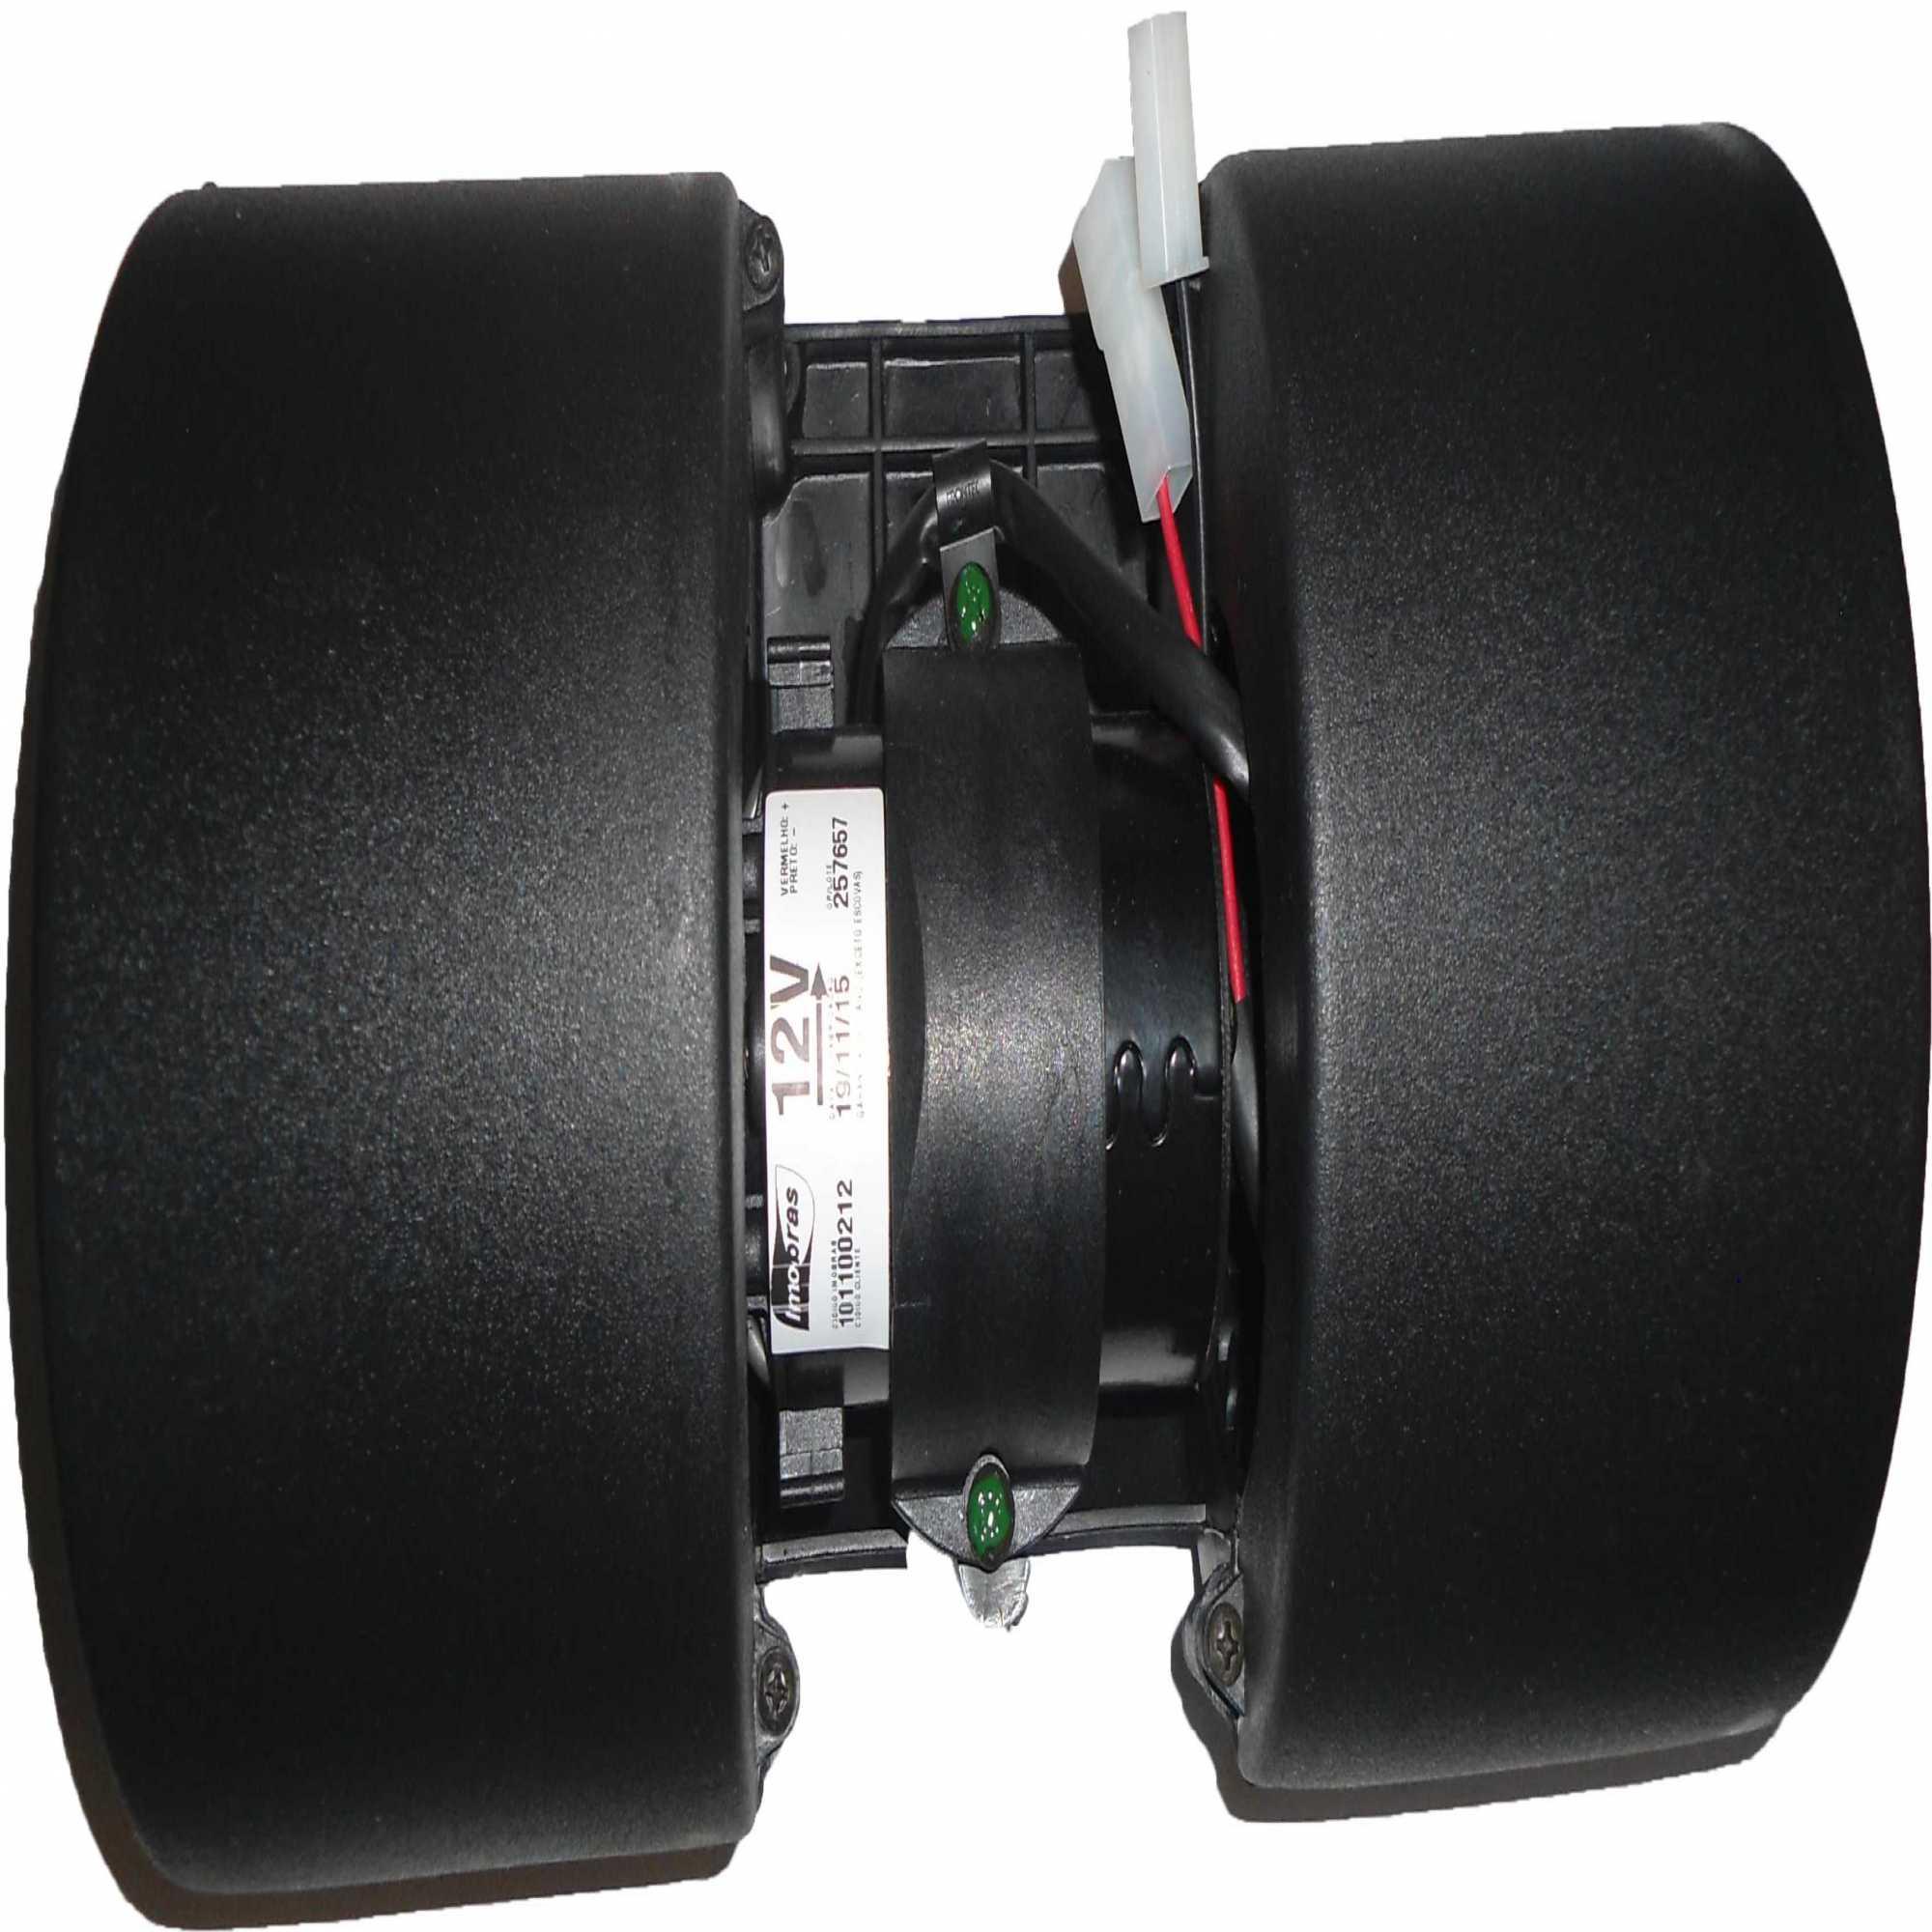 Motor Caixa Evaporadora - Universal Duplo C/Caracol